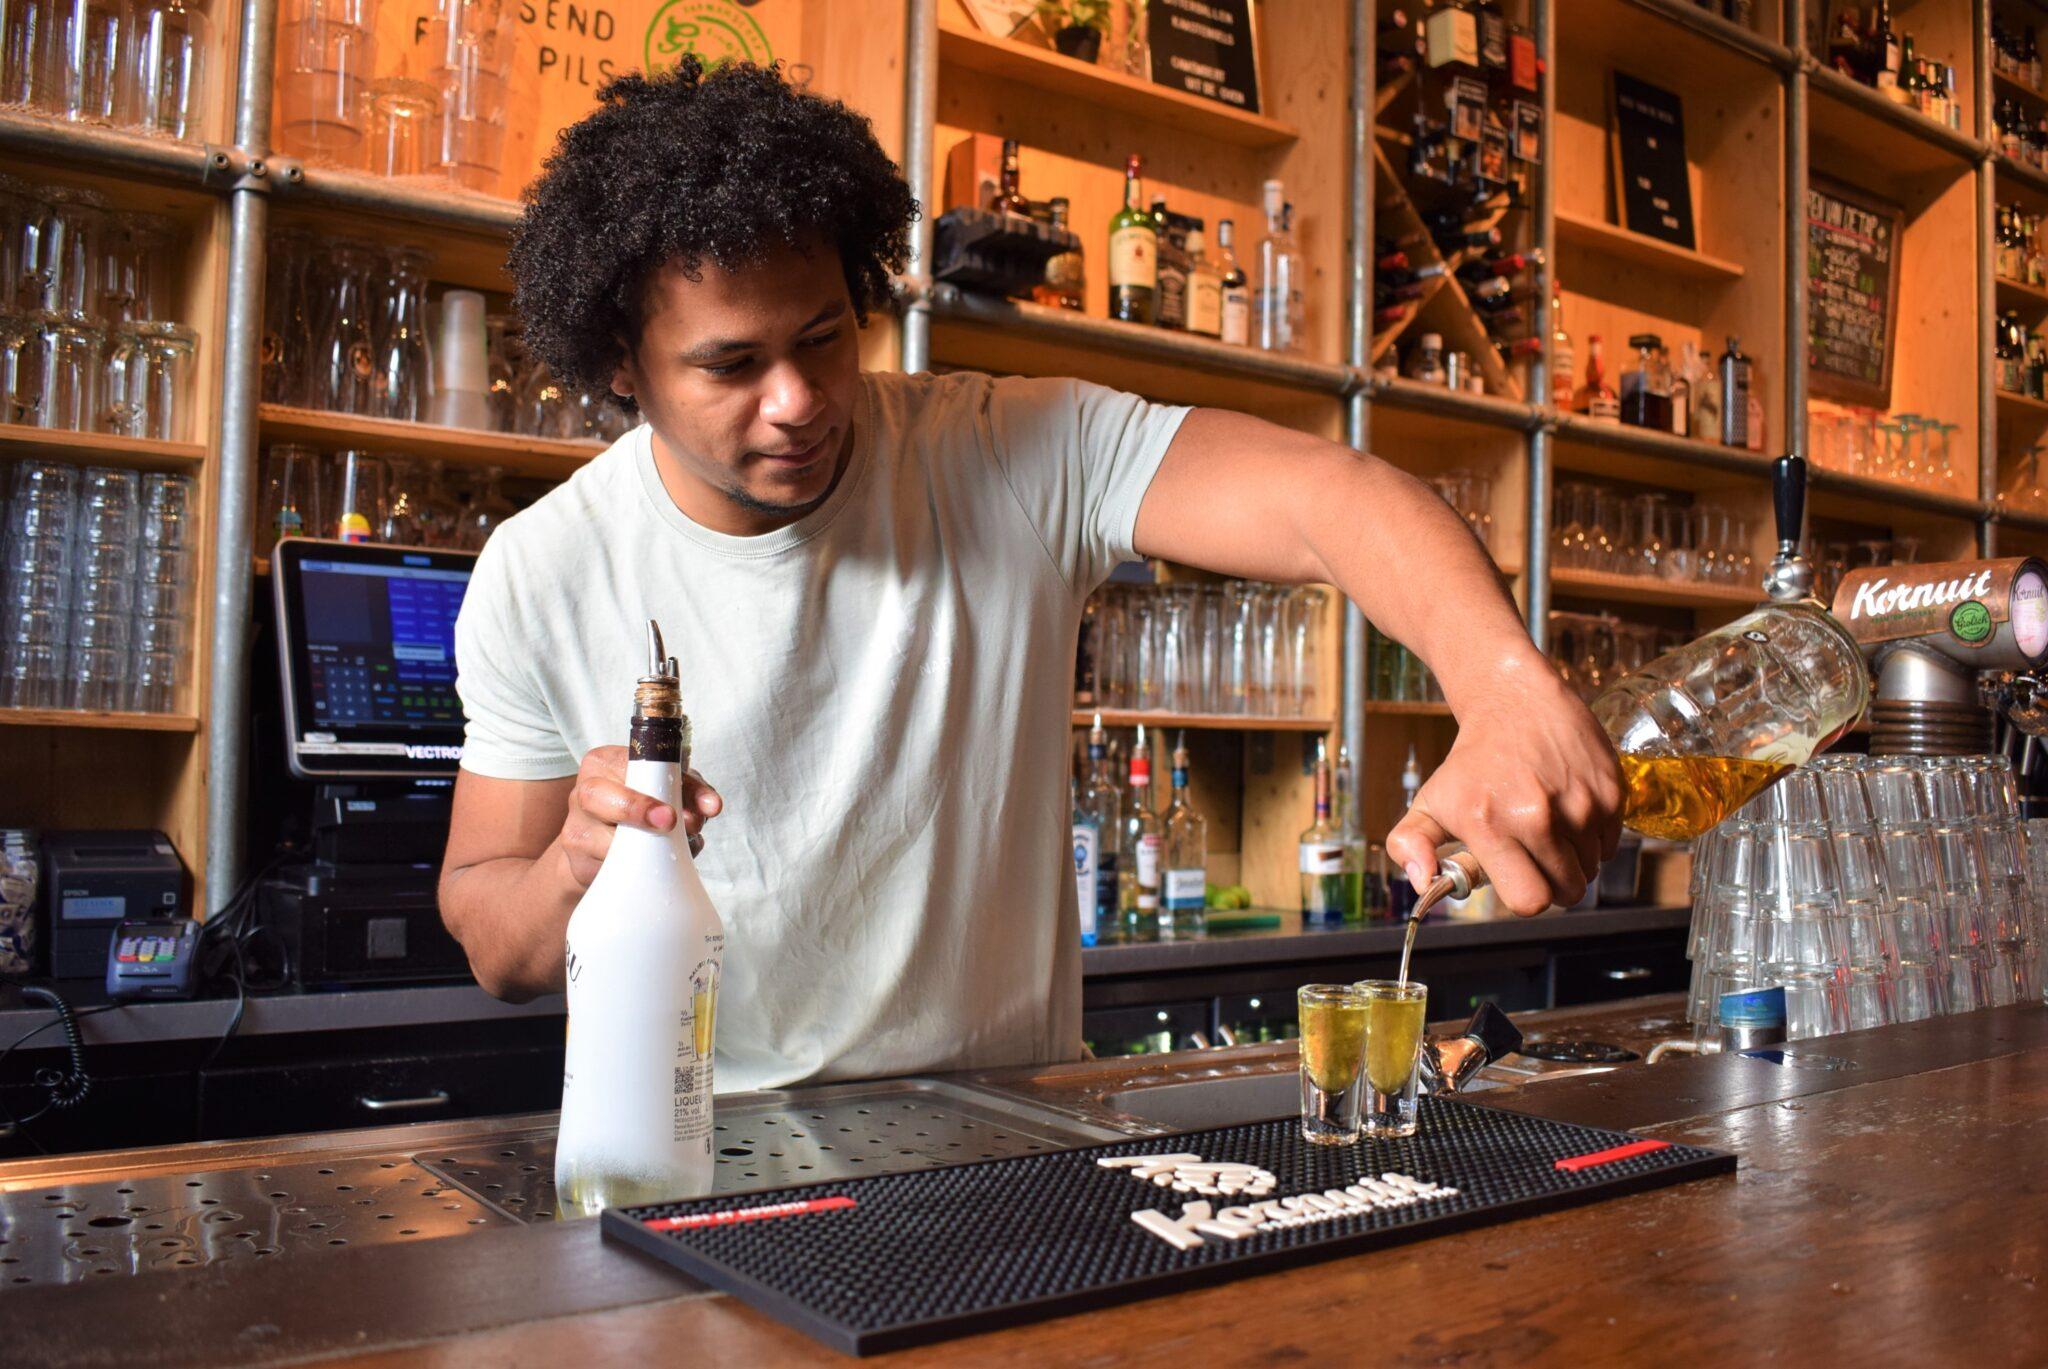 barman kris cafe hofman shotje